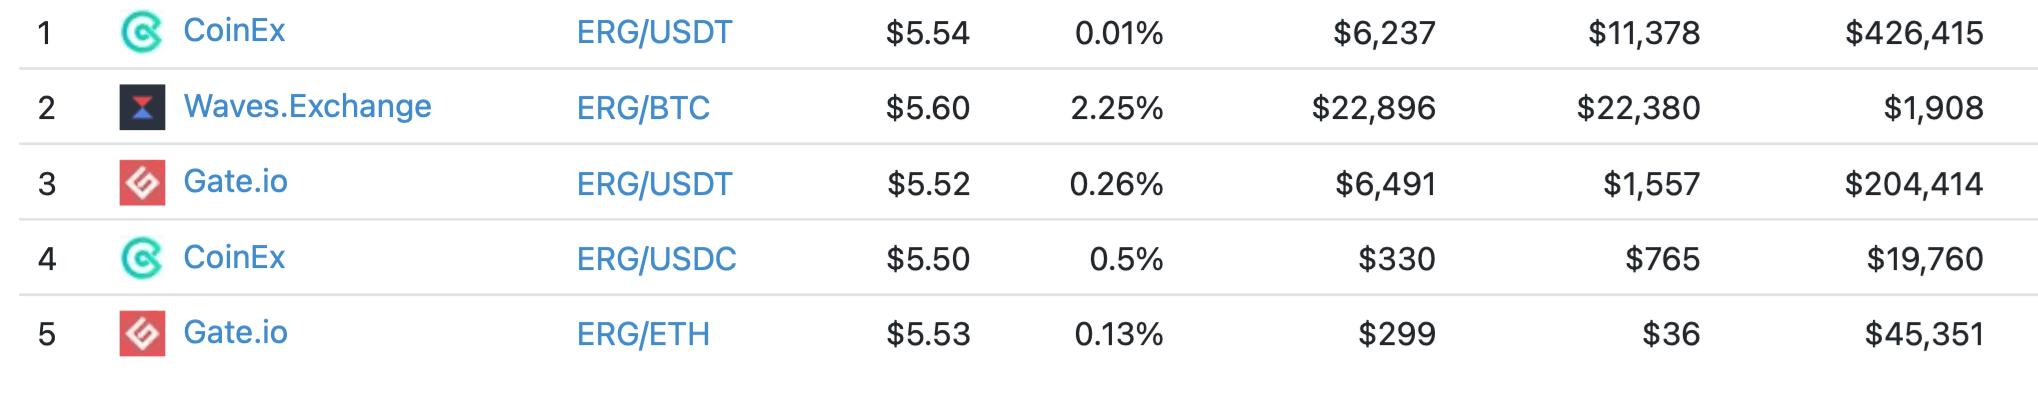 ergo криптовалюты биржи